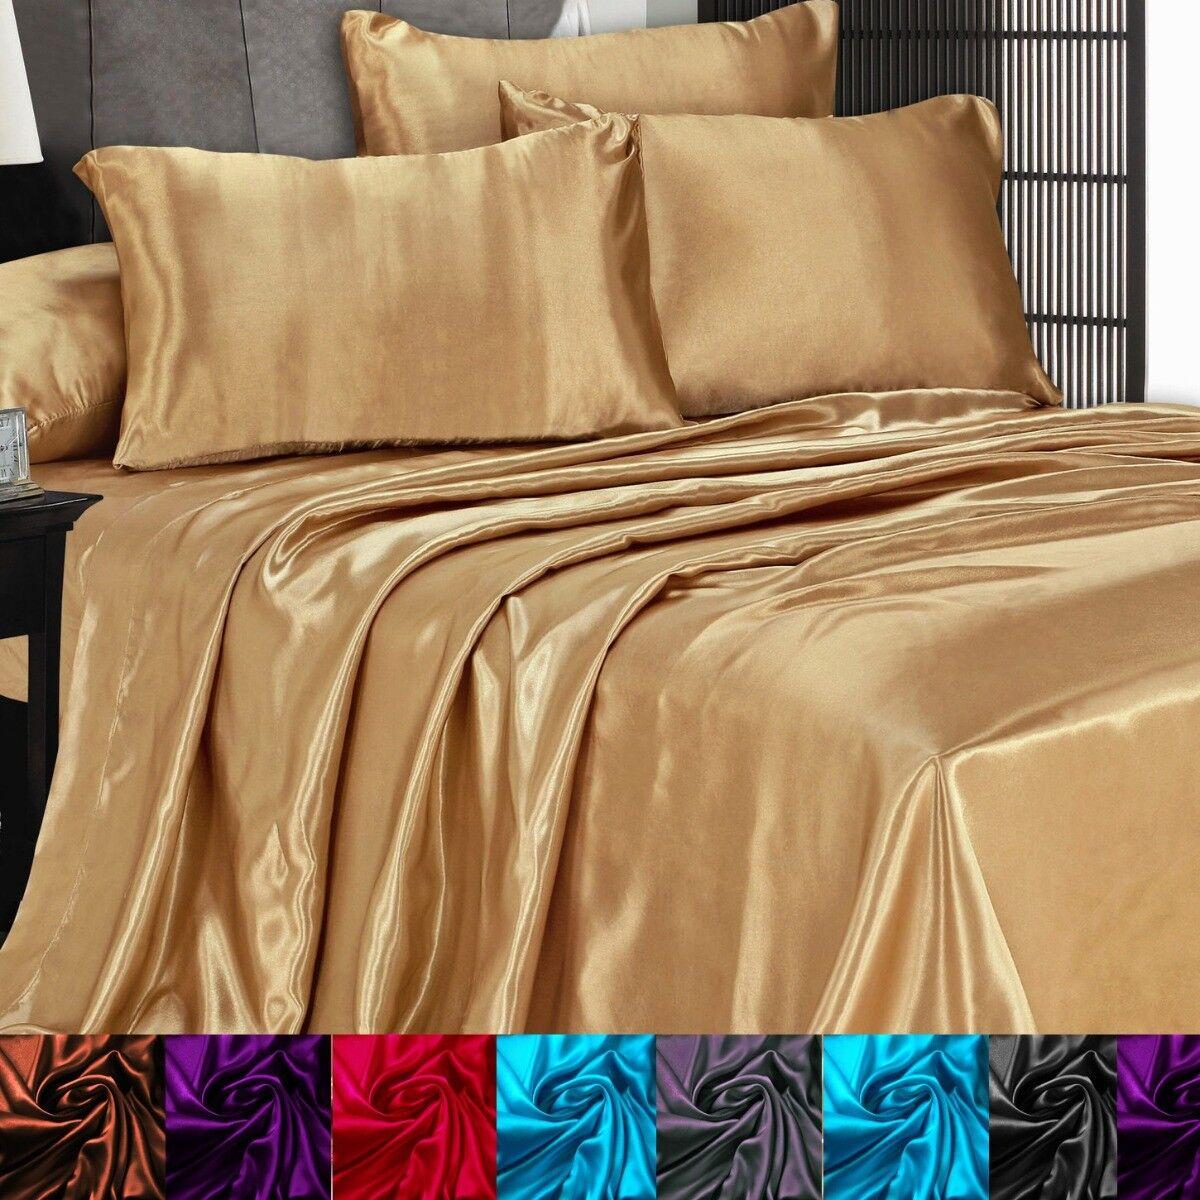 Satin Silky Sheet Set Queen/King Size Flat Fitted Pillows 50